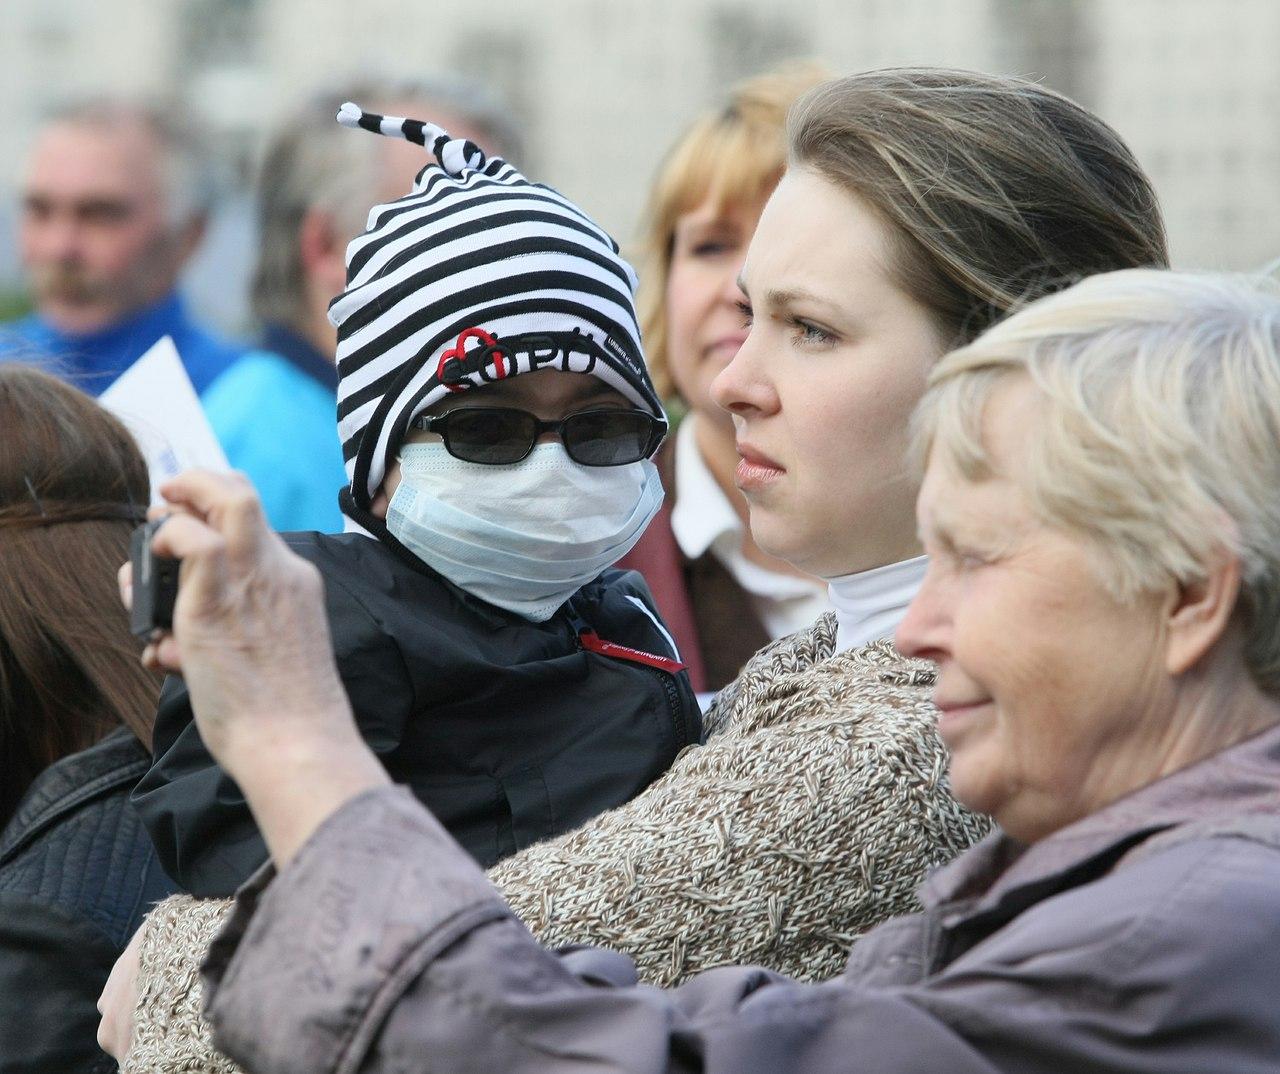 Россиян предупредили об эпидемии гриппа среди американцев